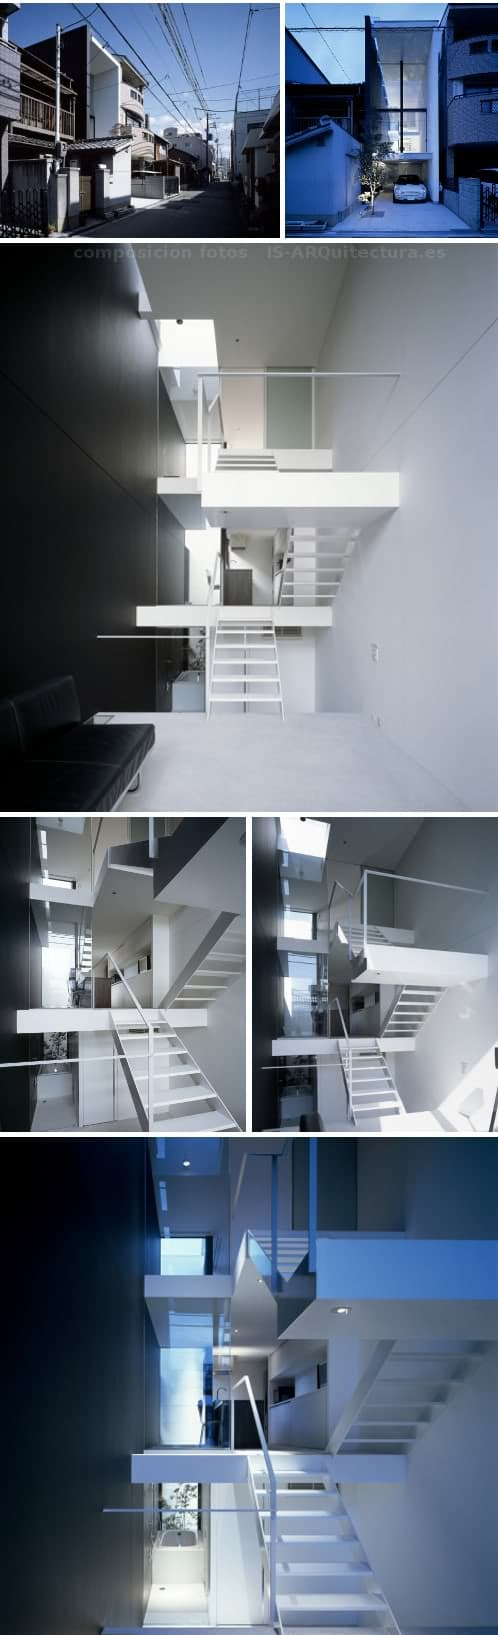 casa entre medianeras en Showa-cho (Osaka) de Shintaro Fujiwara